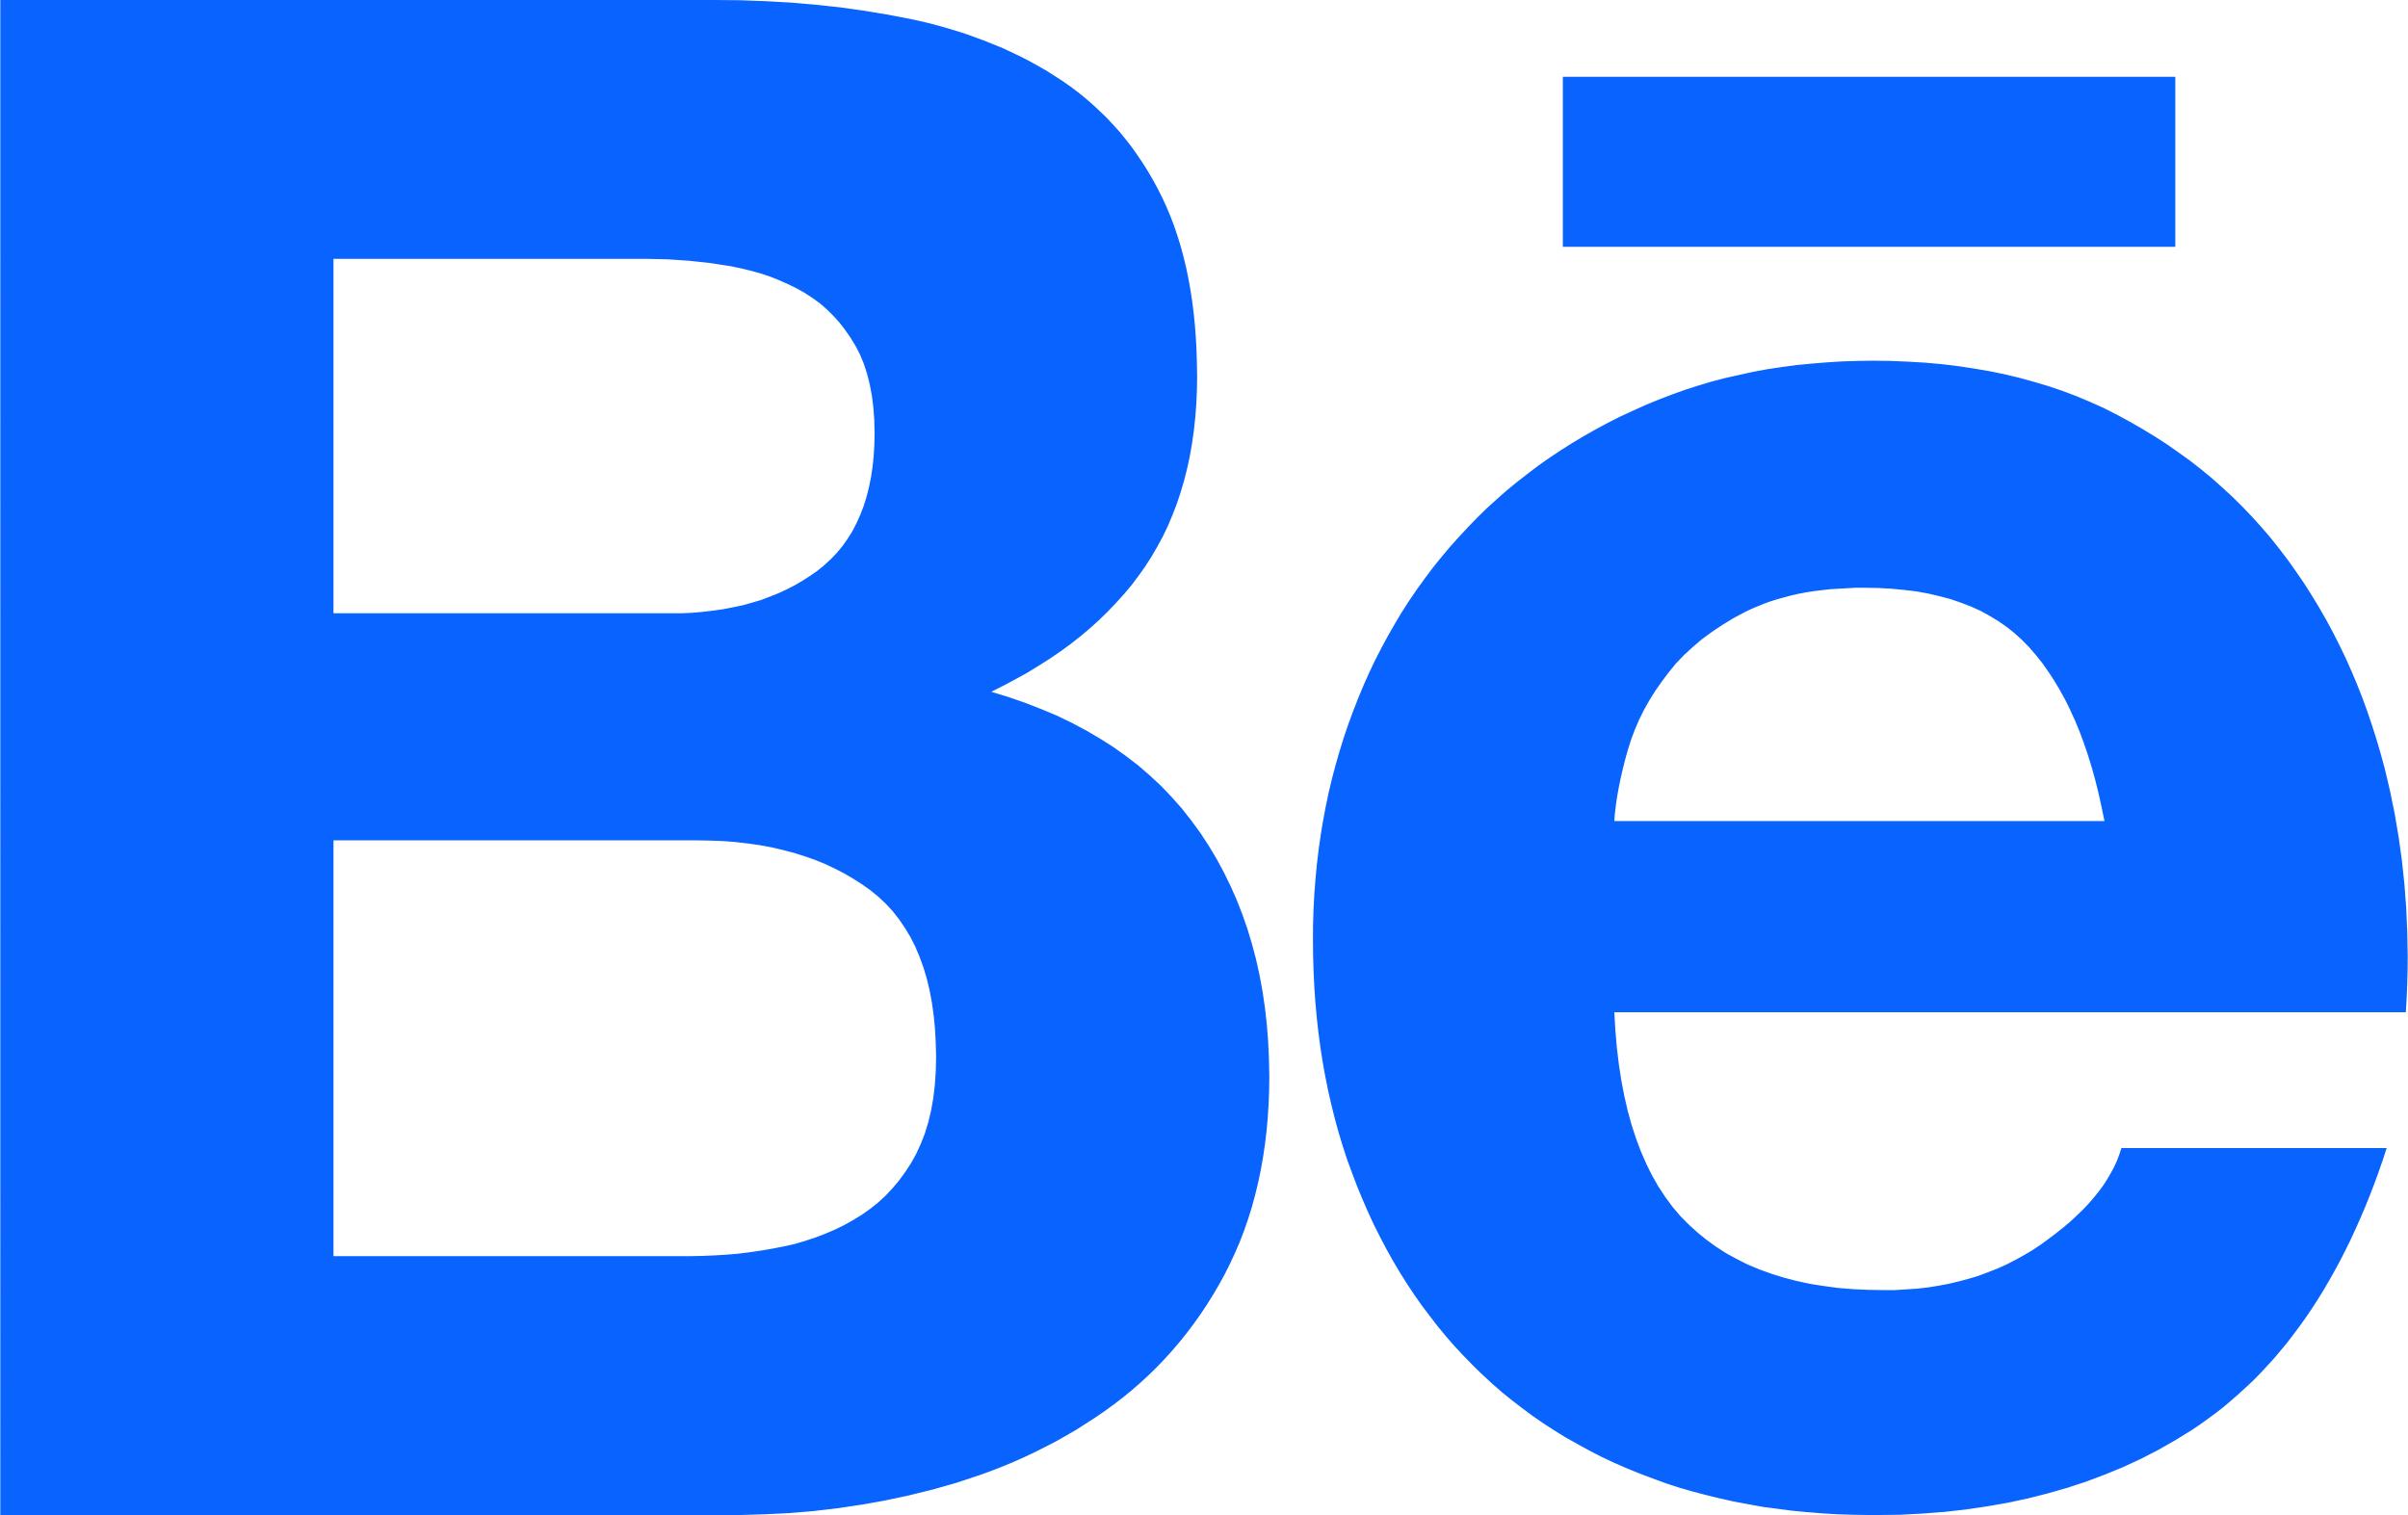 Behance Design Community